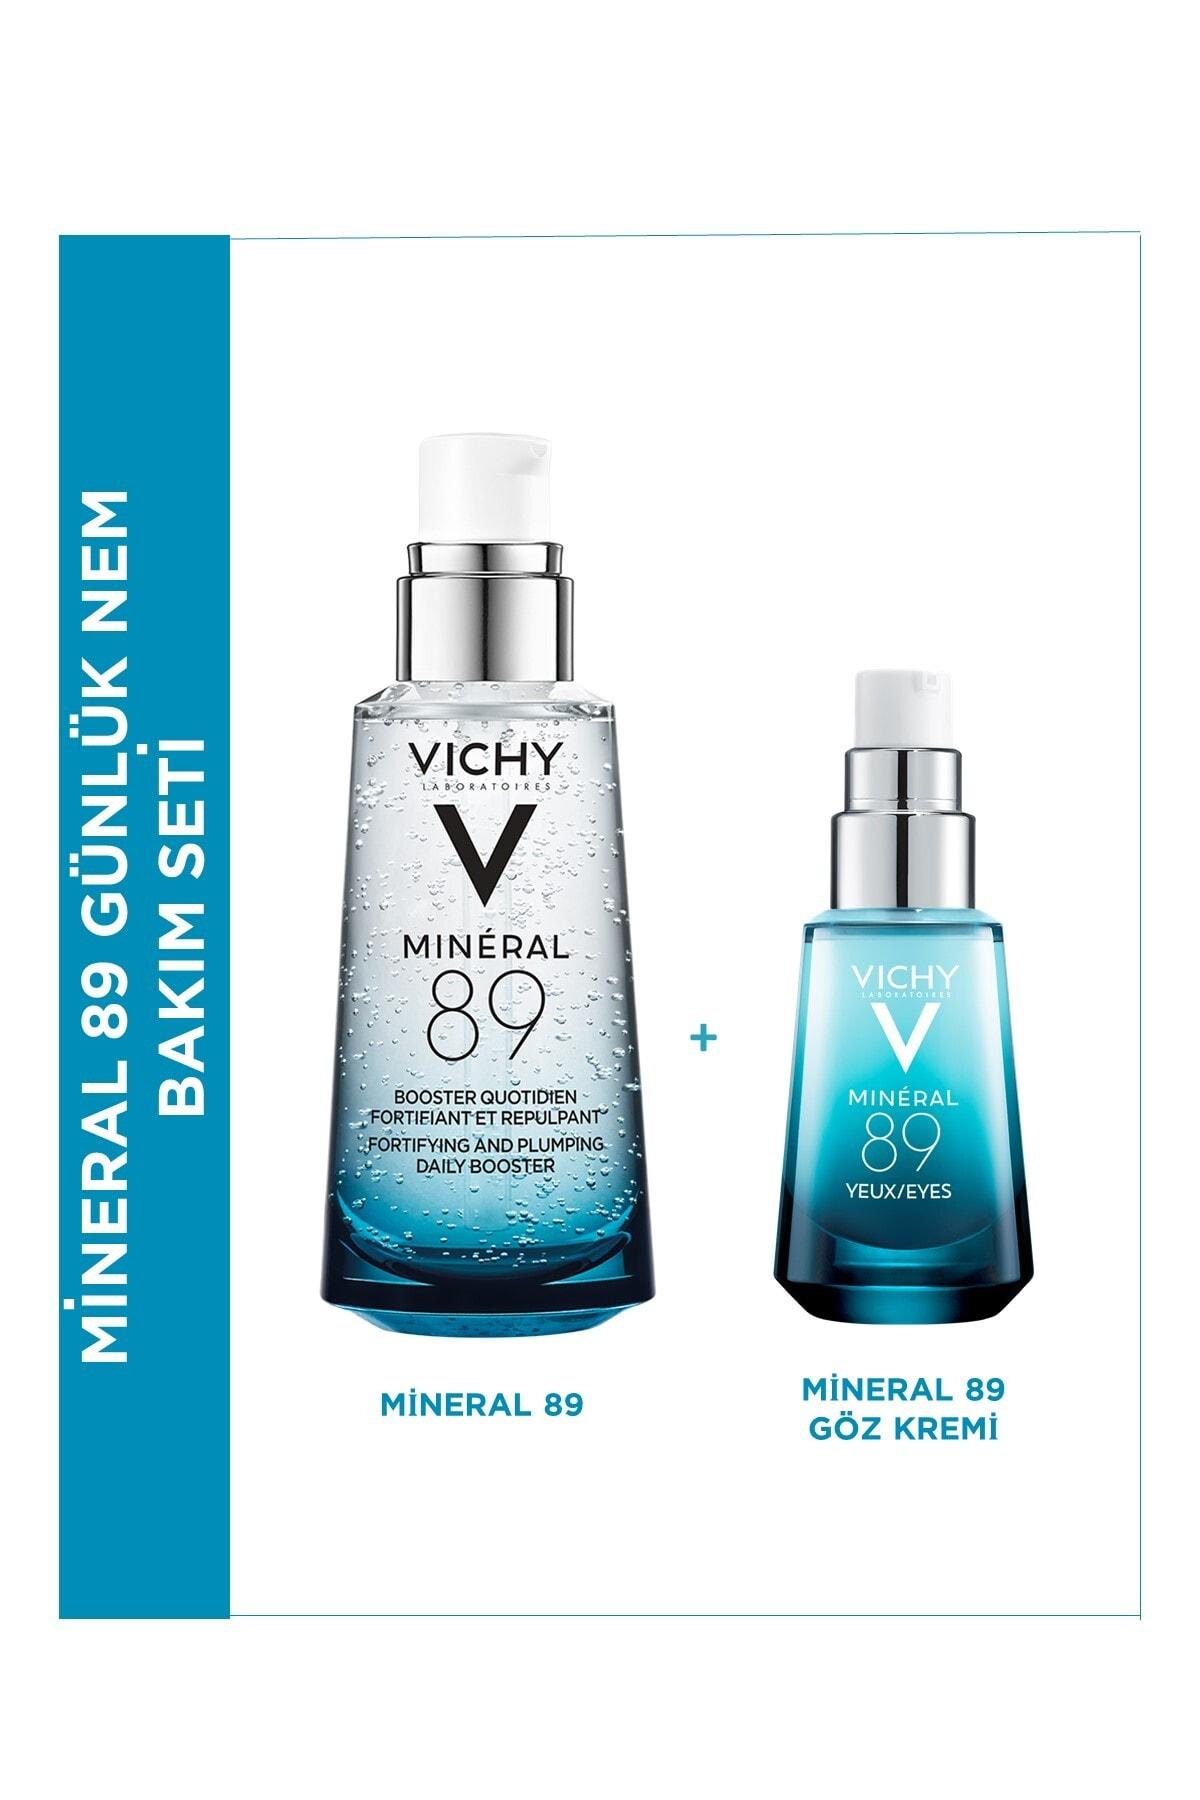 Vichy Mineral 89 Günlük Nem Bakımı Seti  8681689318369